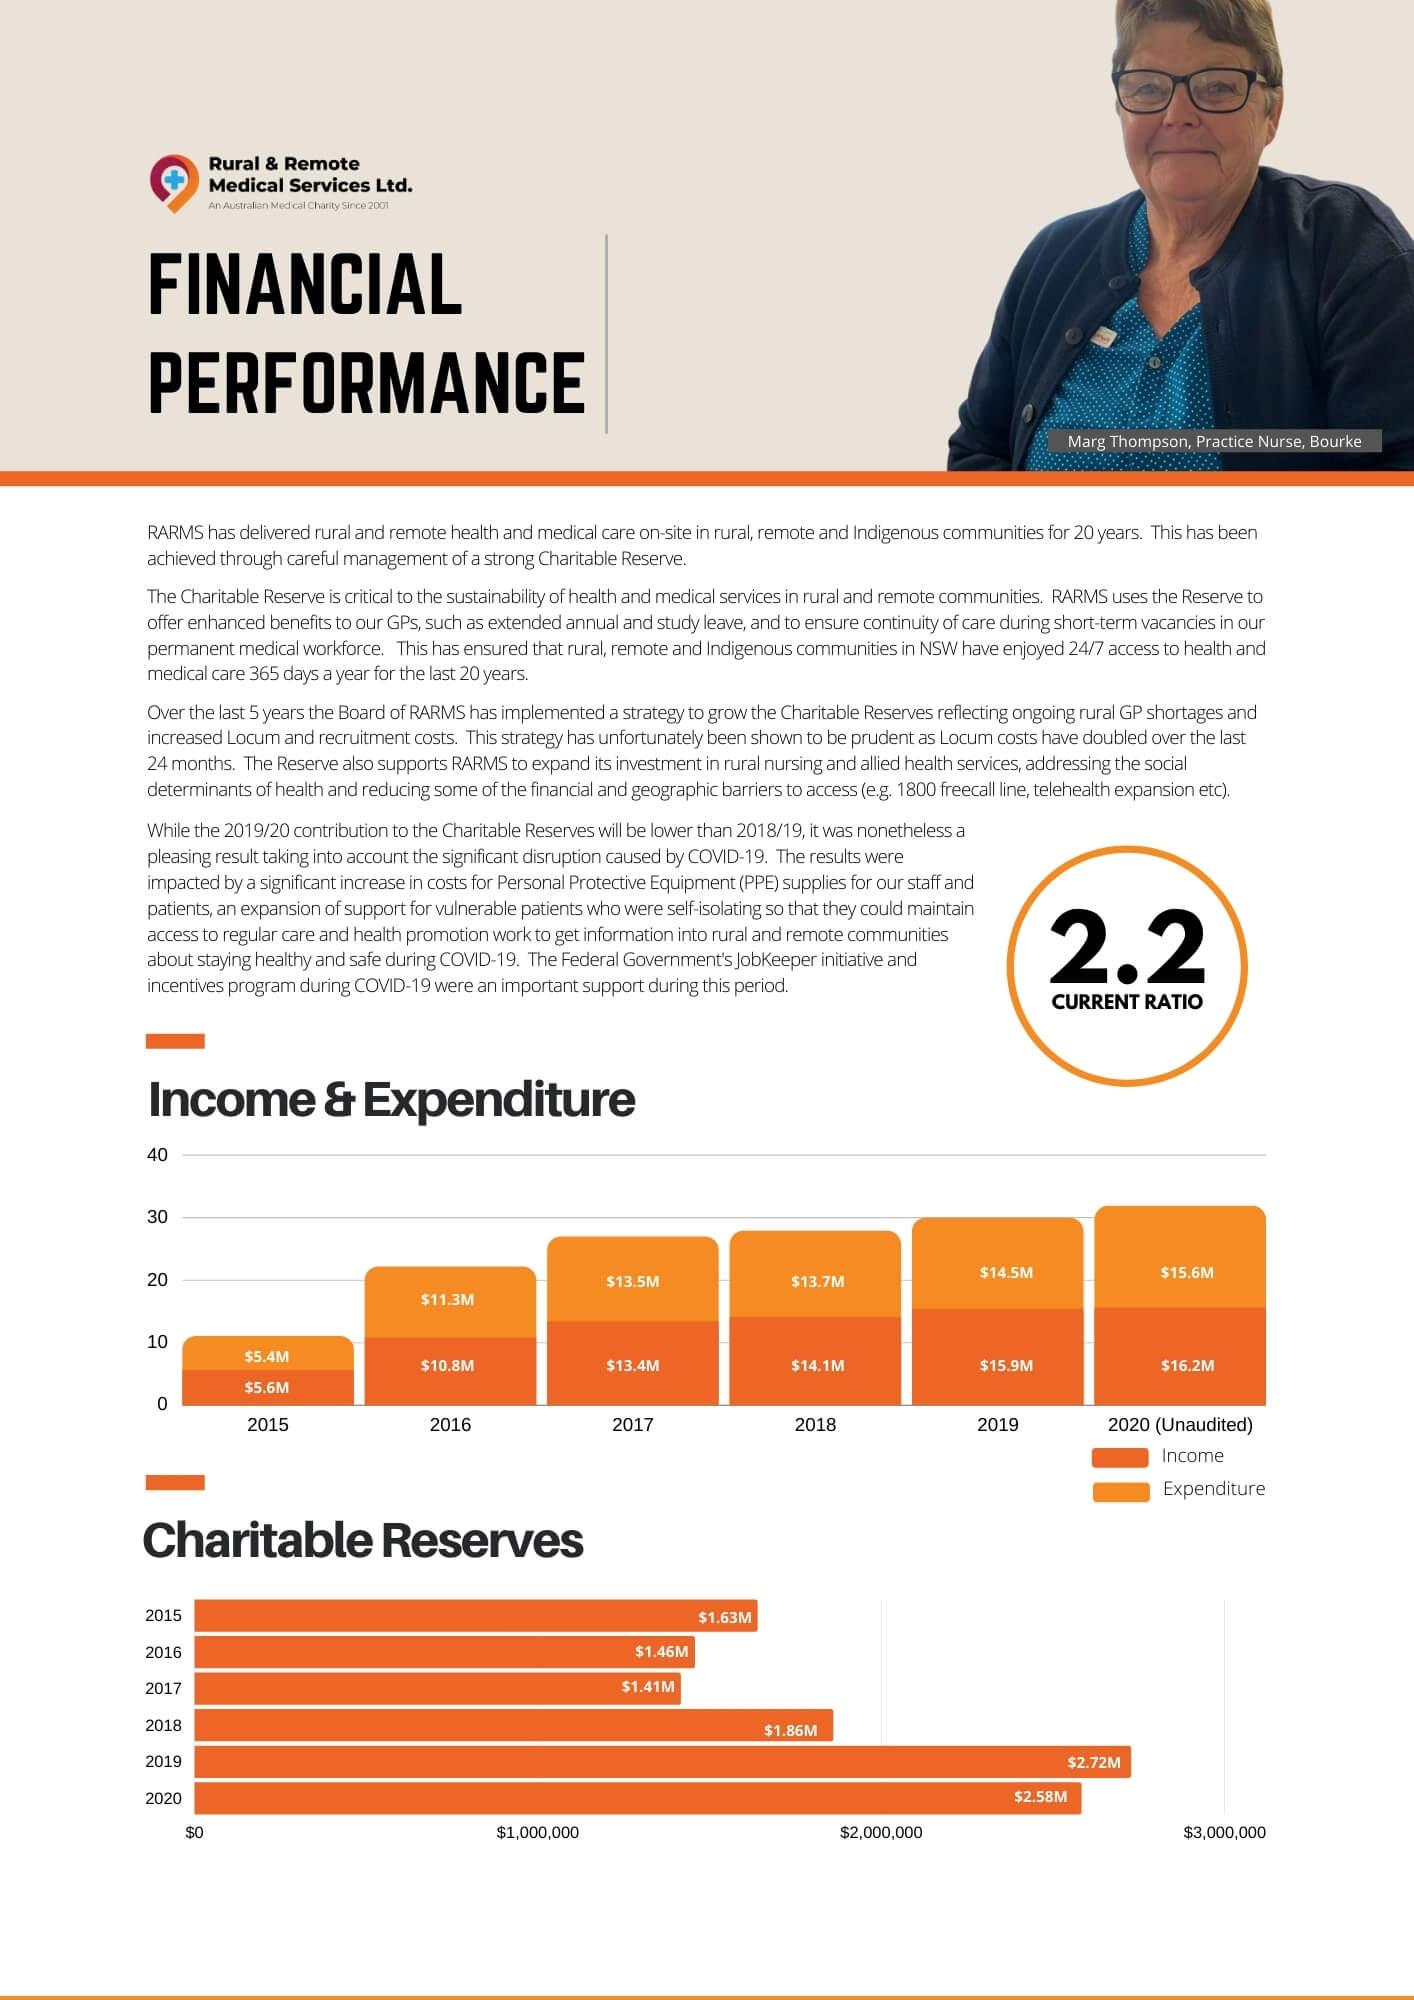 RARMS Financial Performance